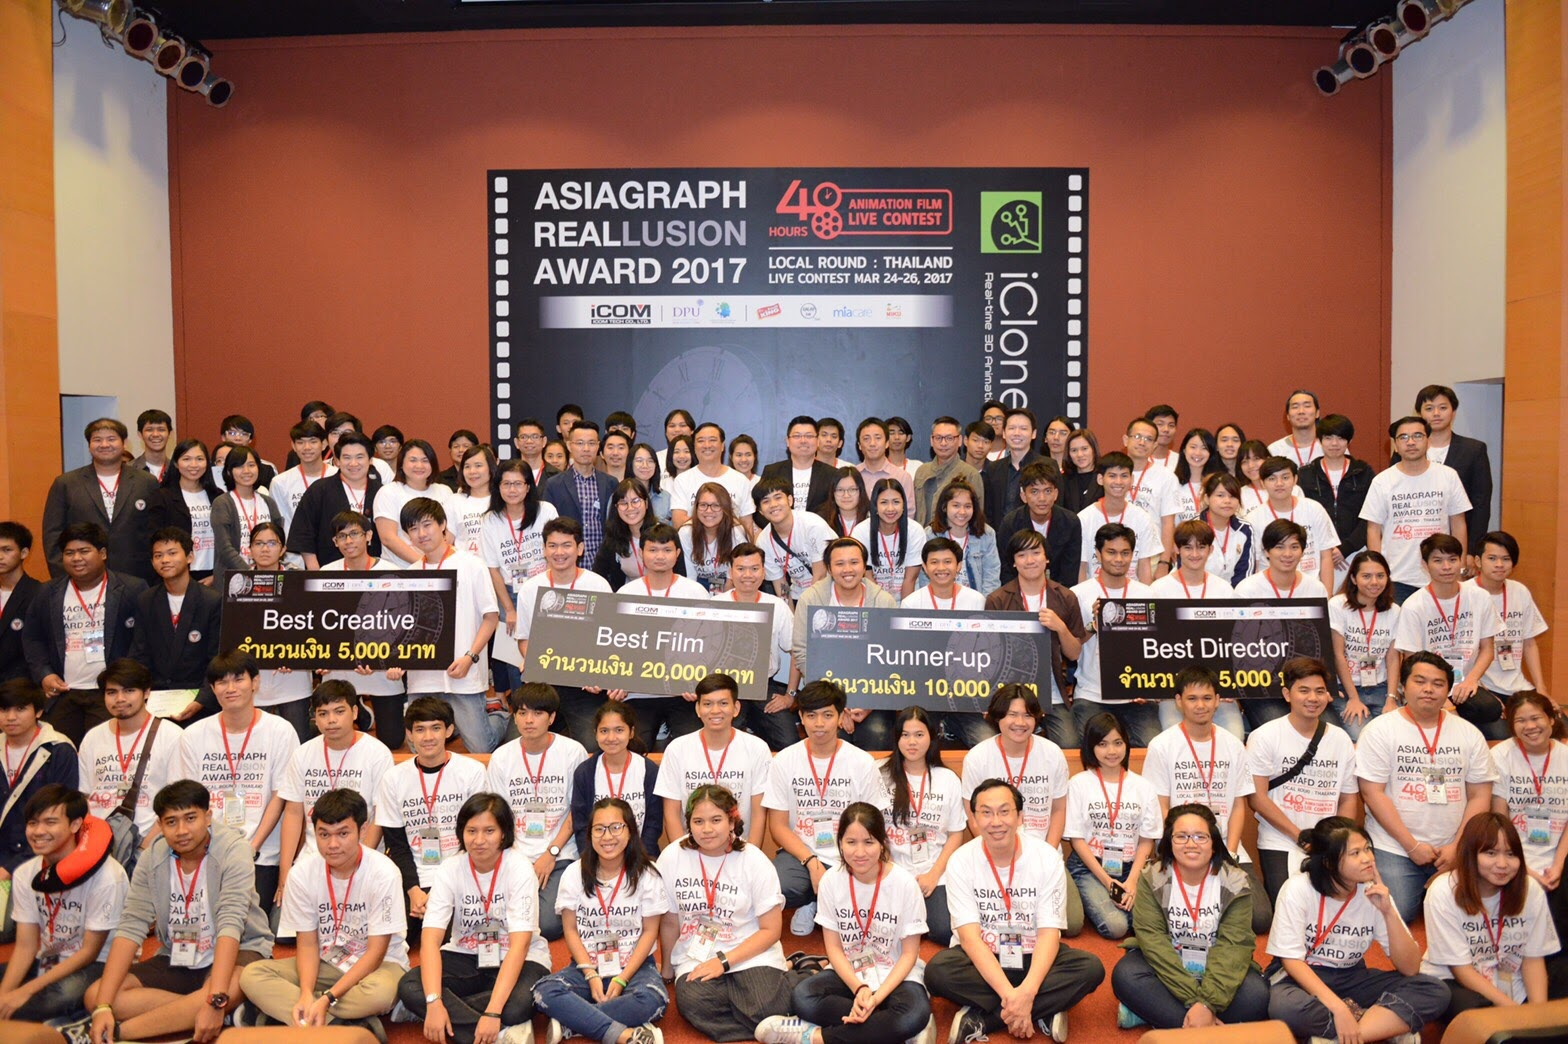 Asiagraph Reallusion Award 2017 การแข่งขันแอนิเมชัน นักศึกษา แอนิเมชัน